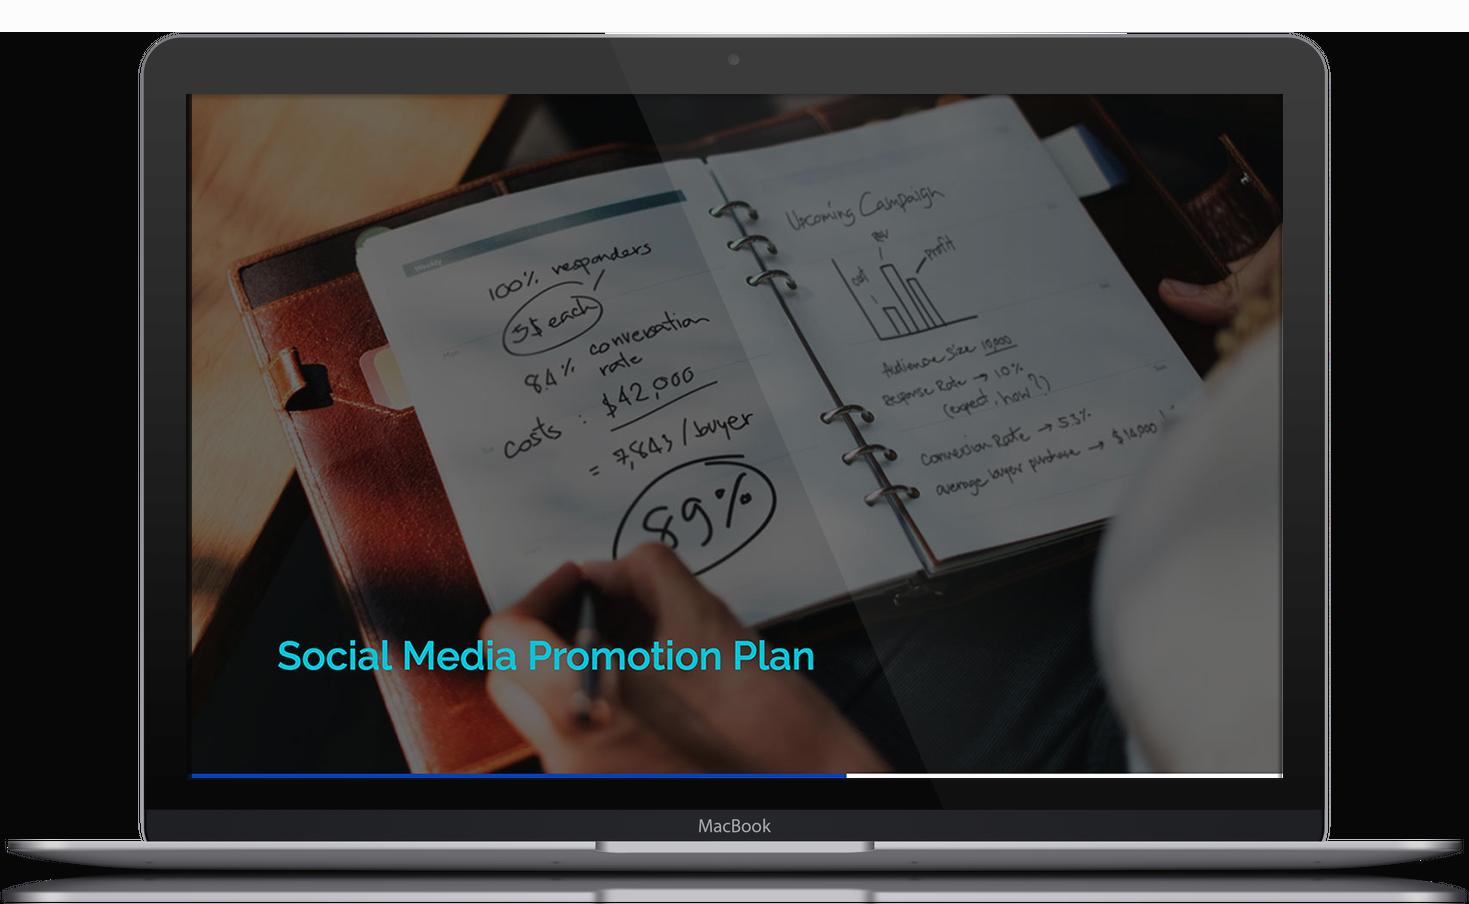 Social-Media-marketing-plan-template4.png